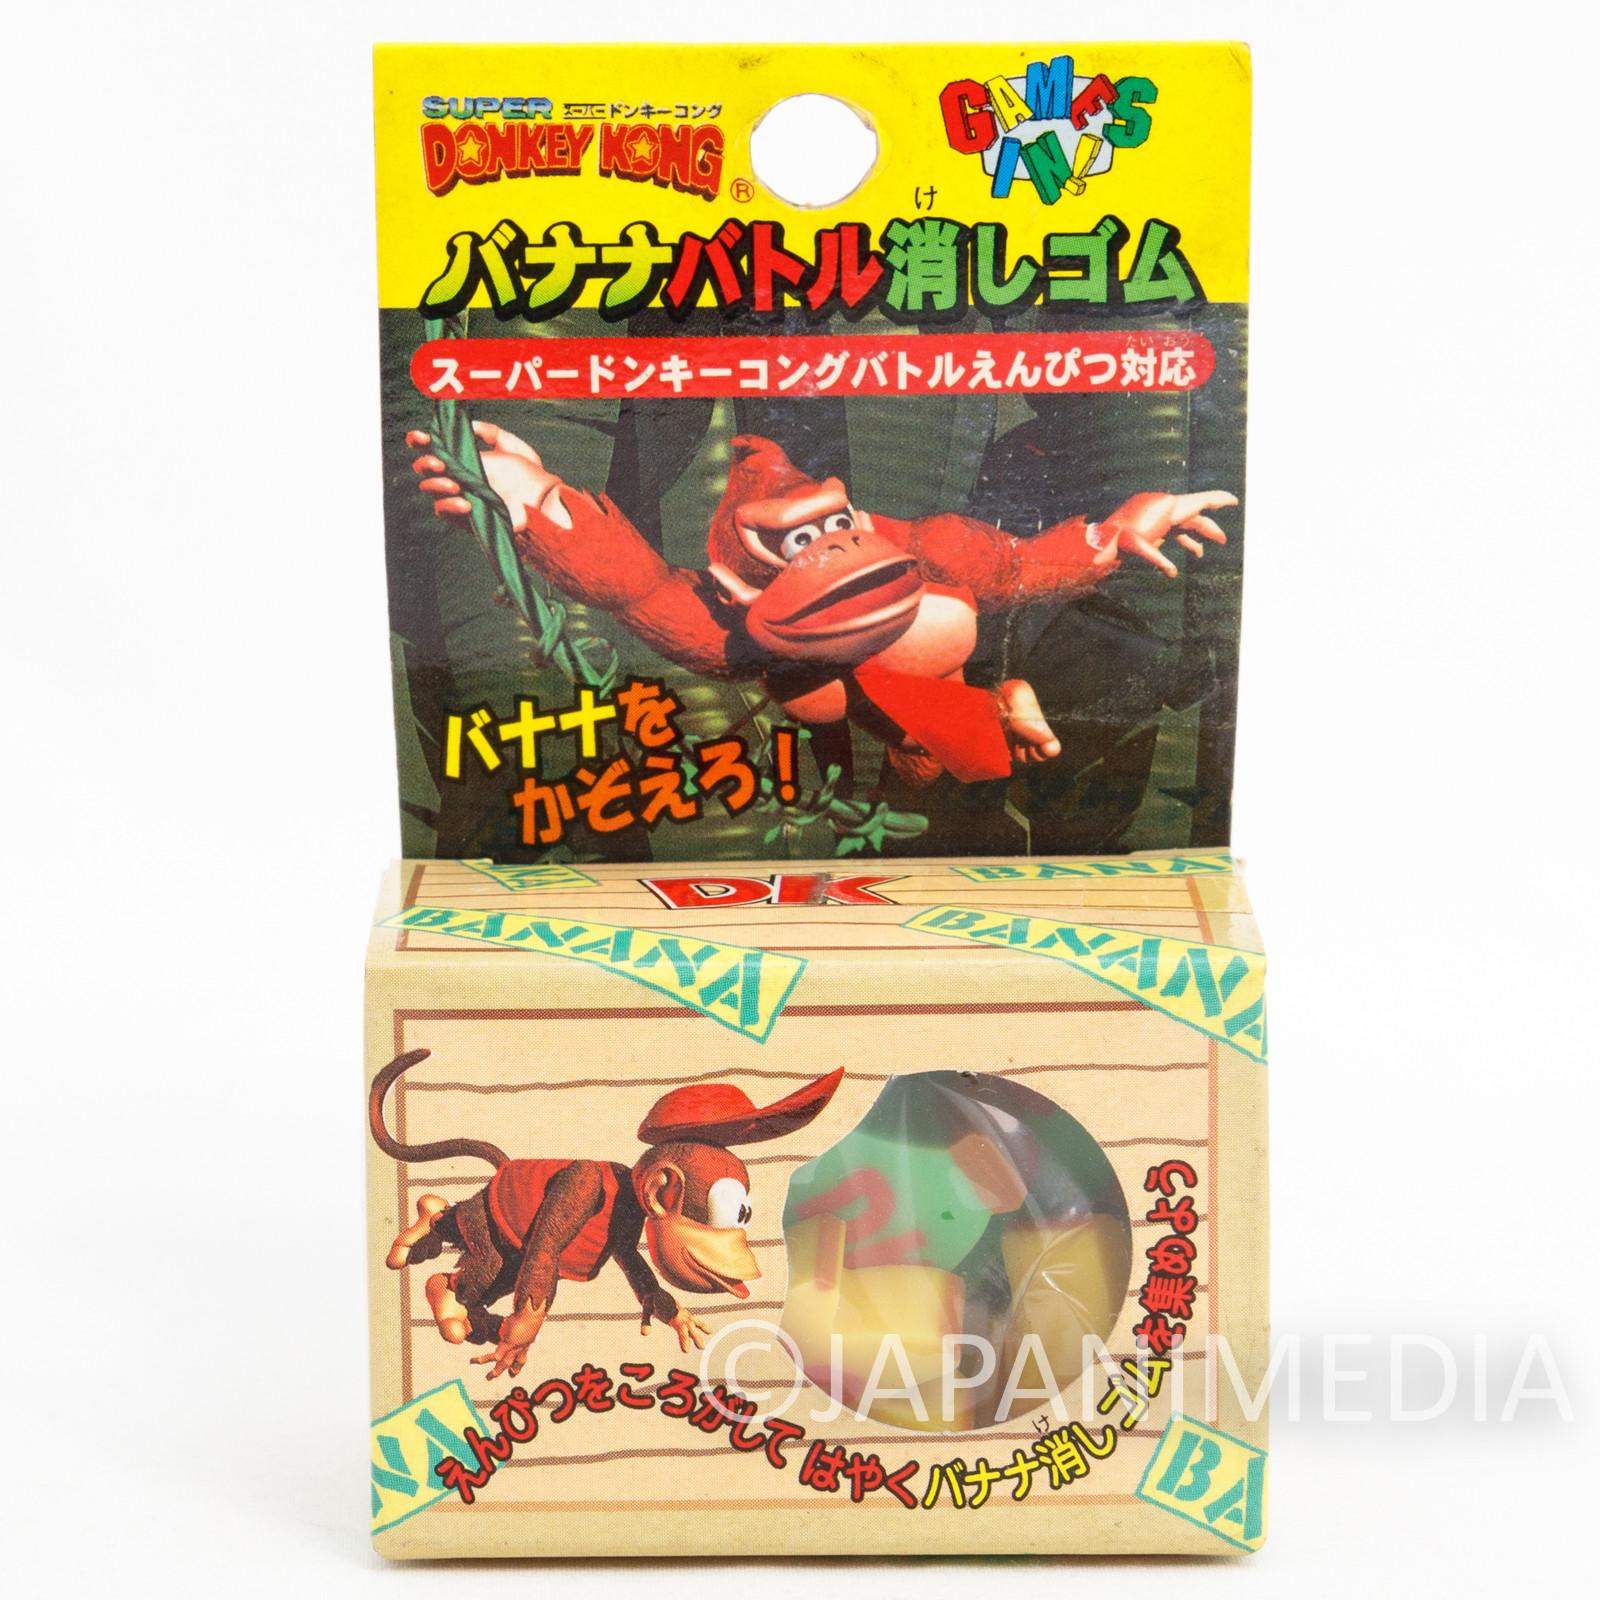 Donkey Kong Banana type Eraser 12pc Set Nintendo JAPAN FAMICOM SNES